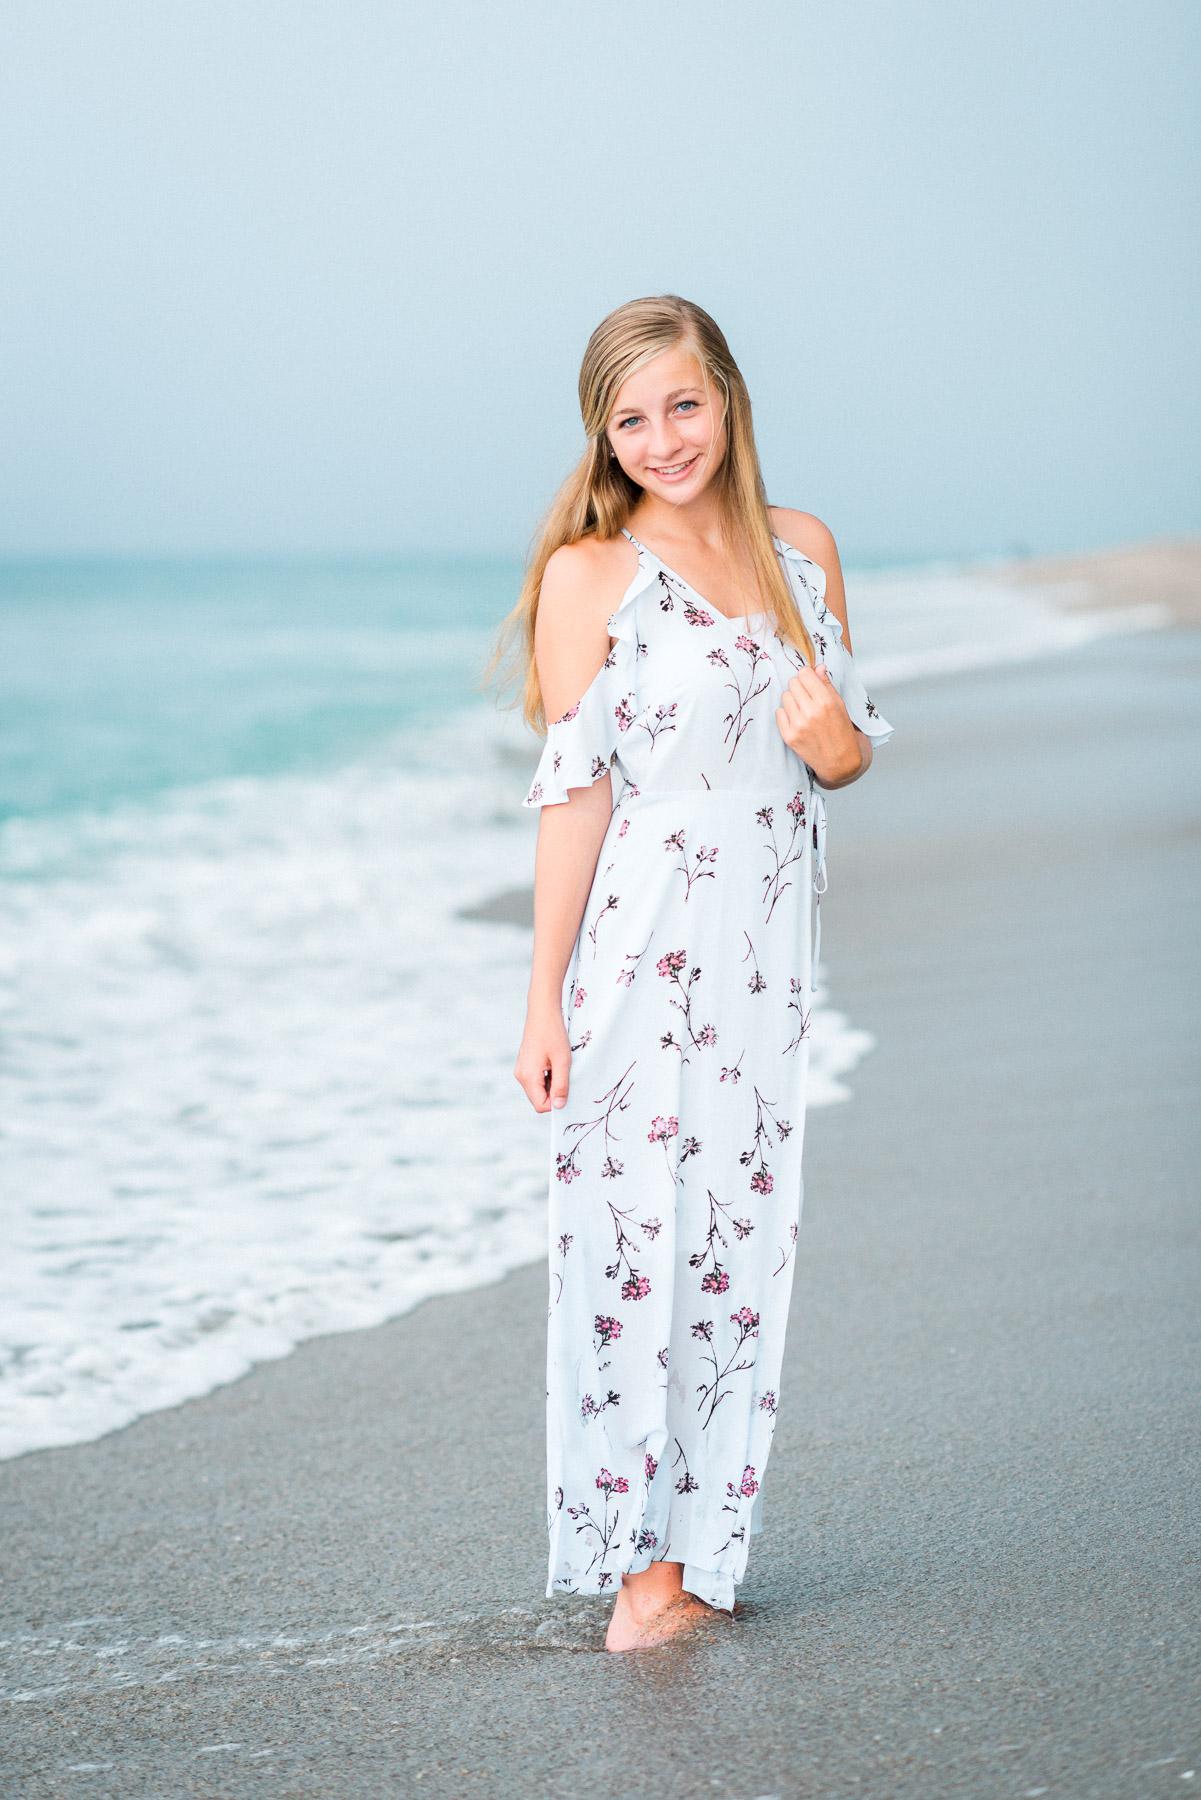 KateTaramykinStudios-West-Palm-Beach-Senior-Portraits-Katie-5.jpg